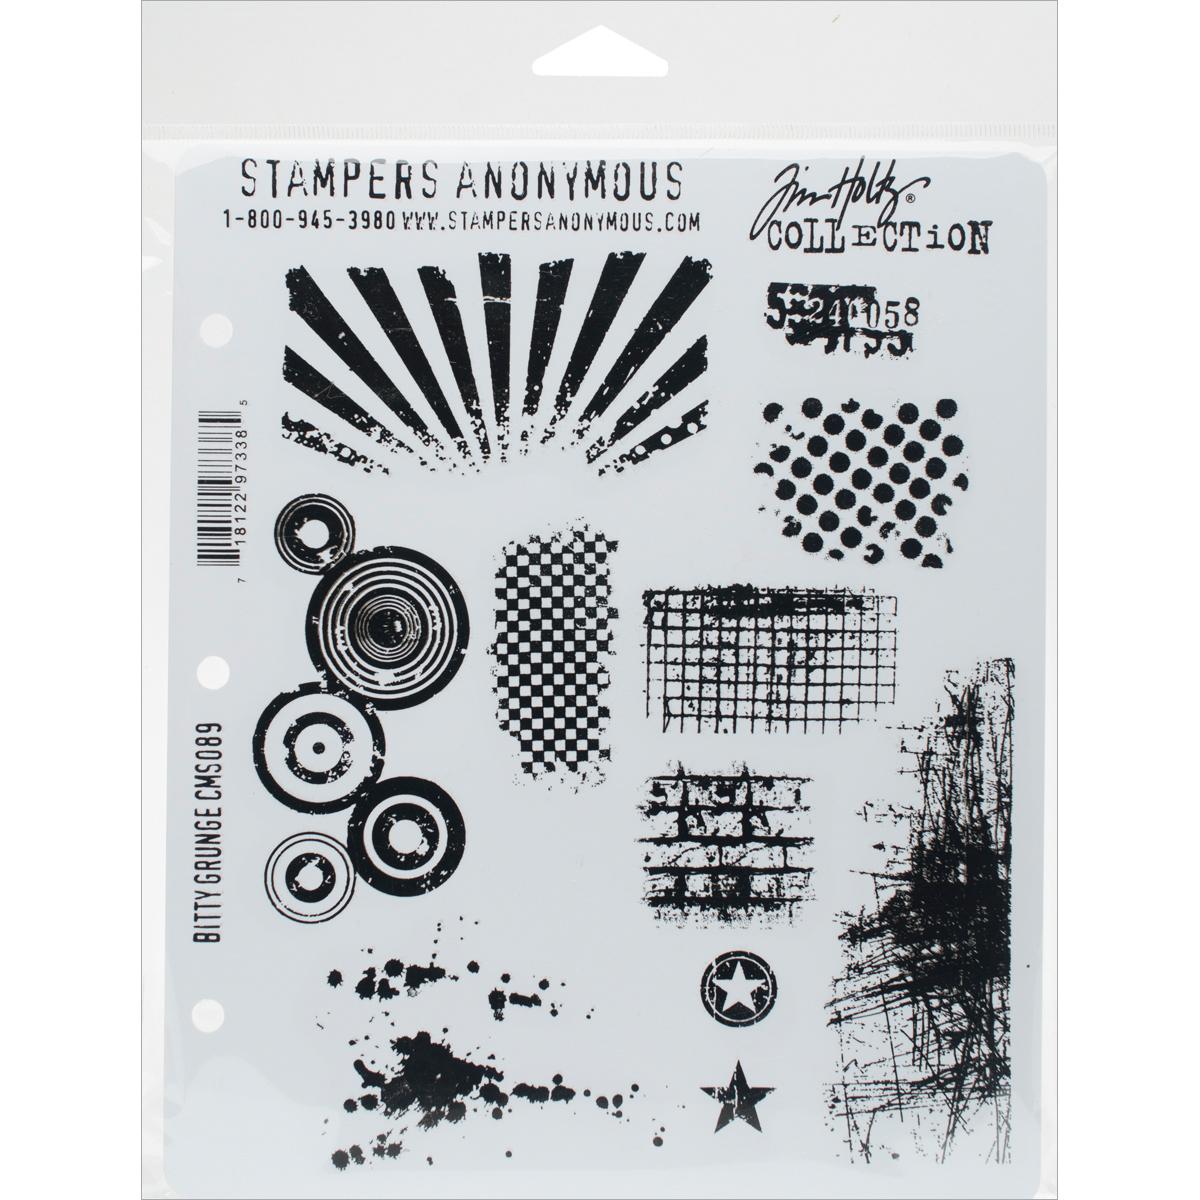 Tim Holtz Cling Stamps 7X8.5-Bitty Grunge